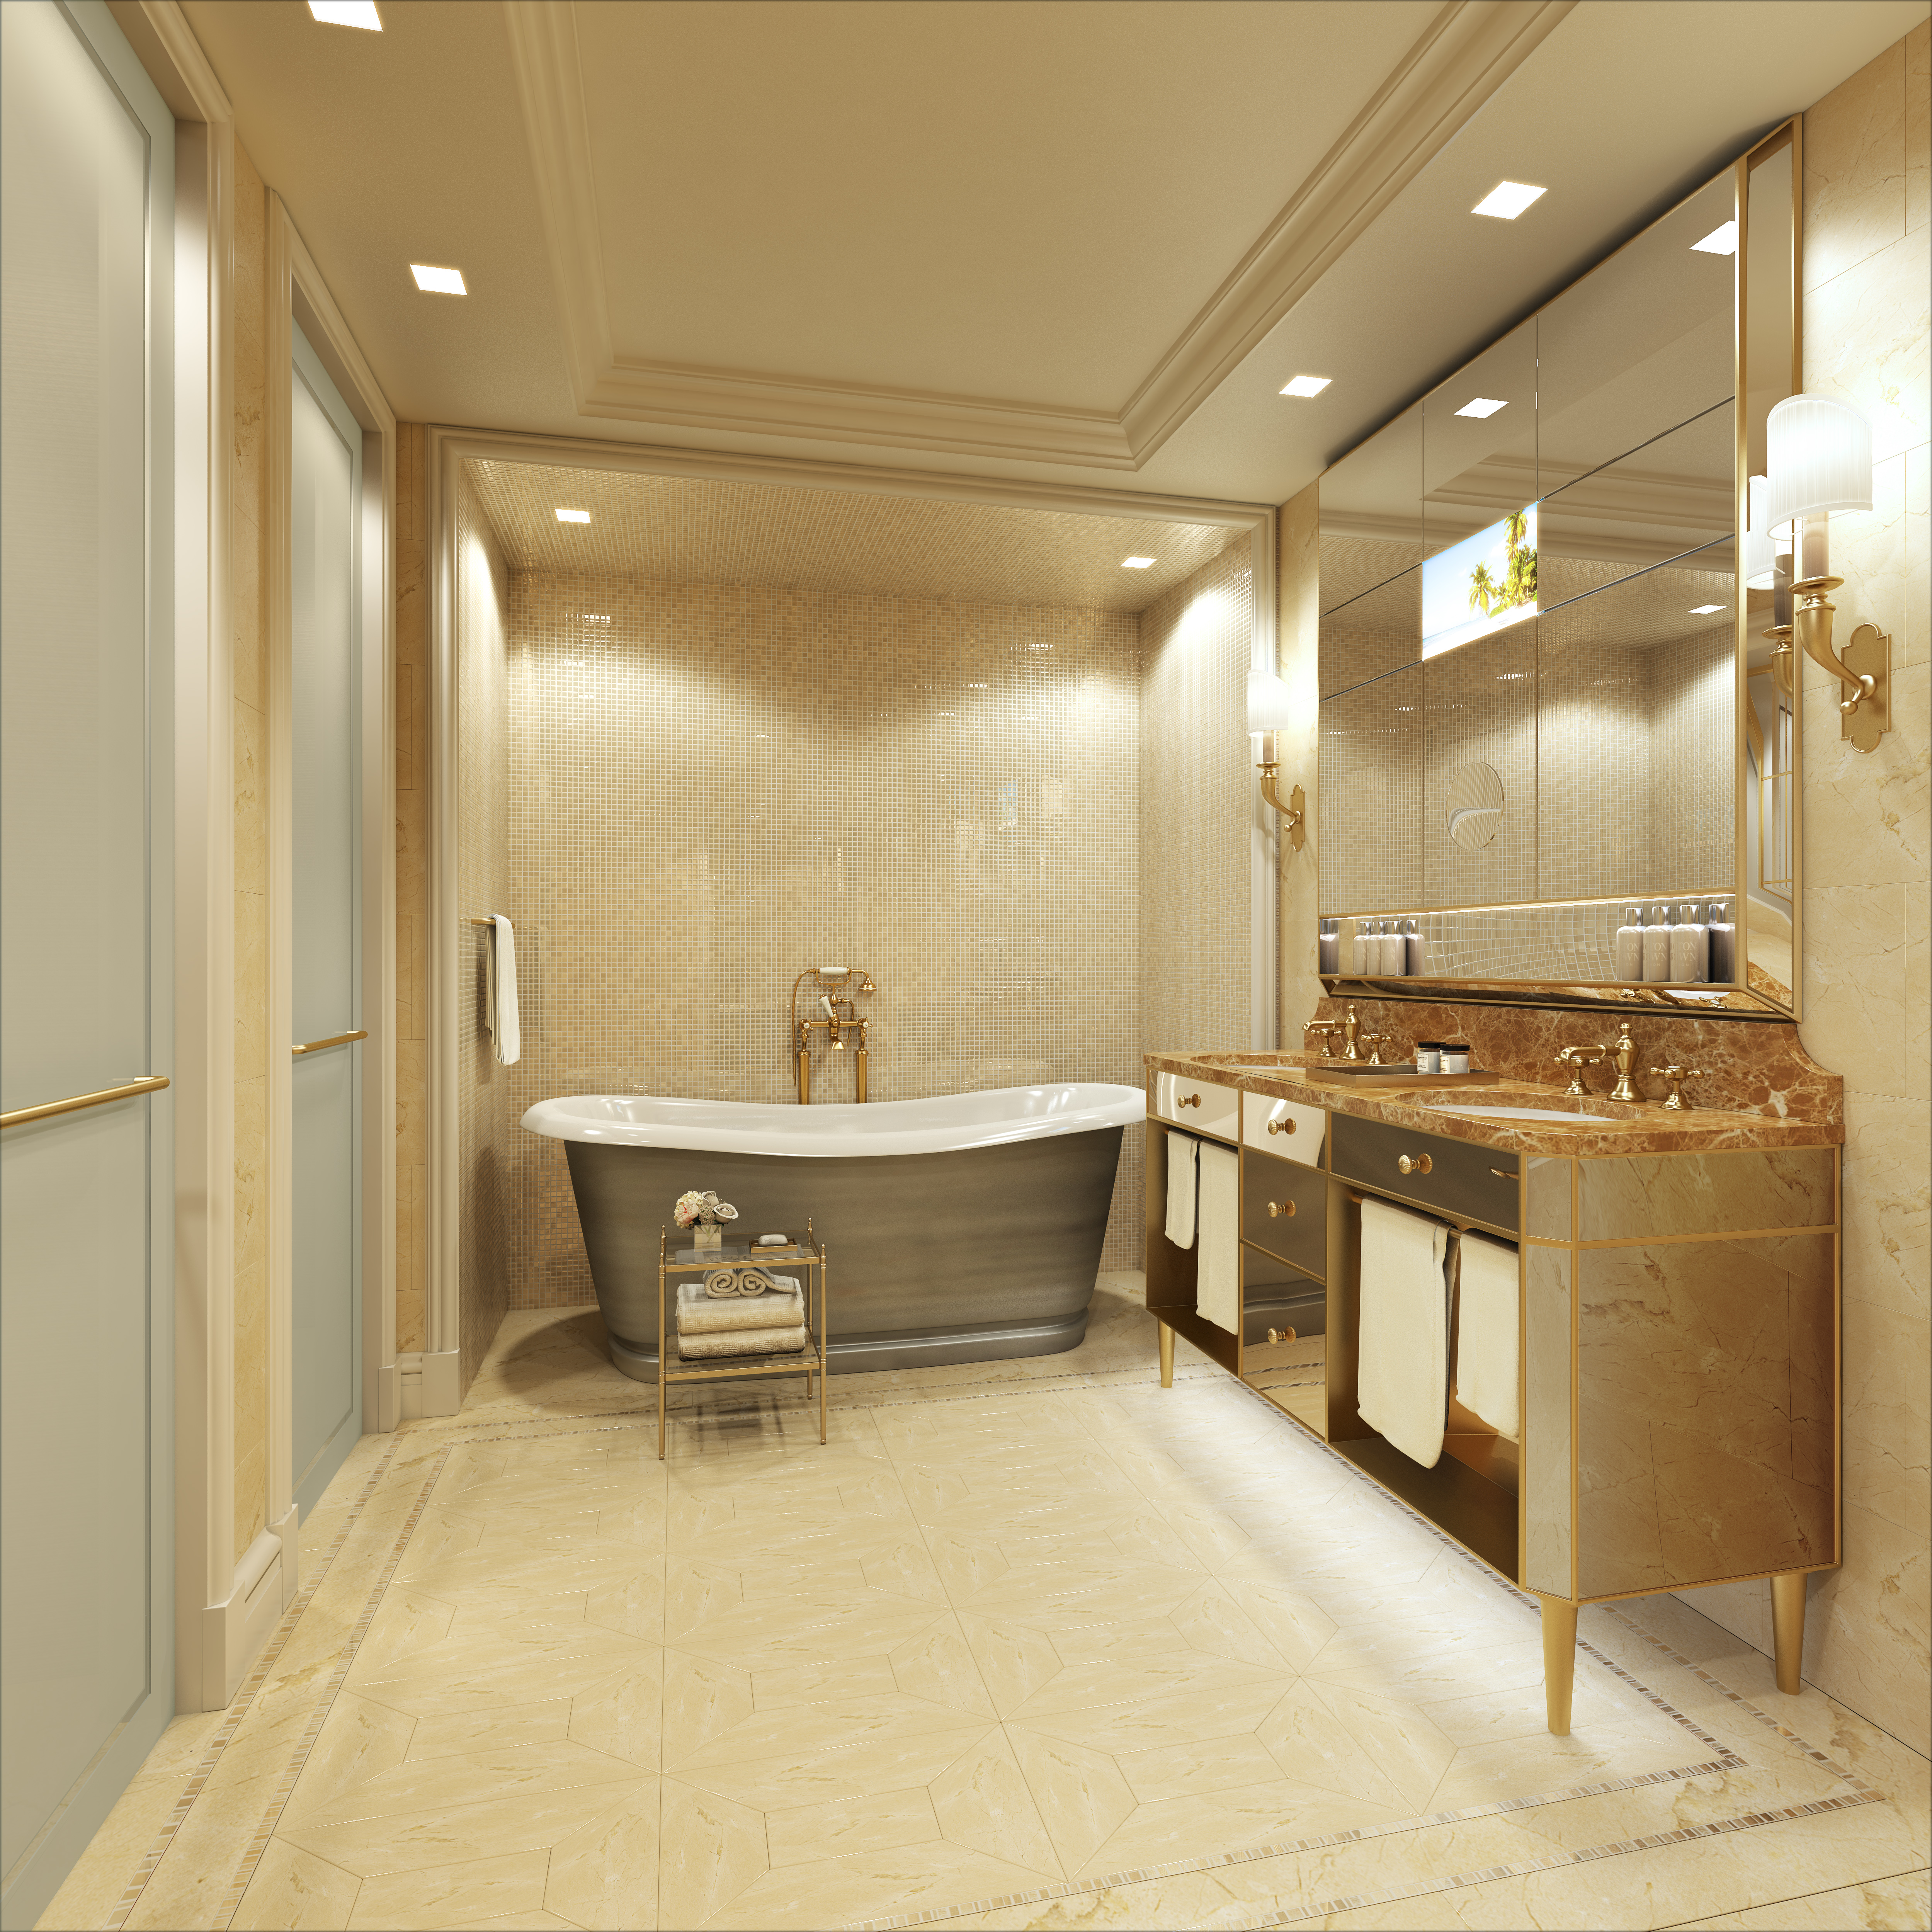 Premiere_King_Bathroom_V1_003